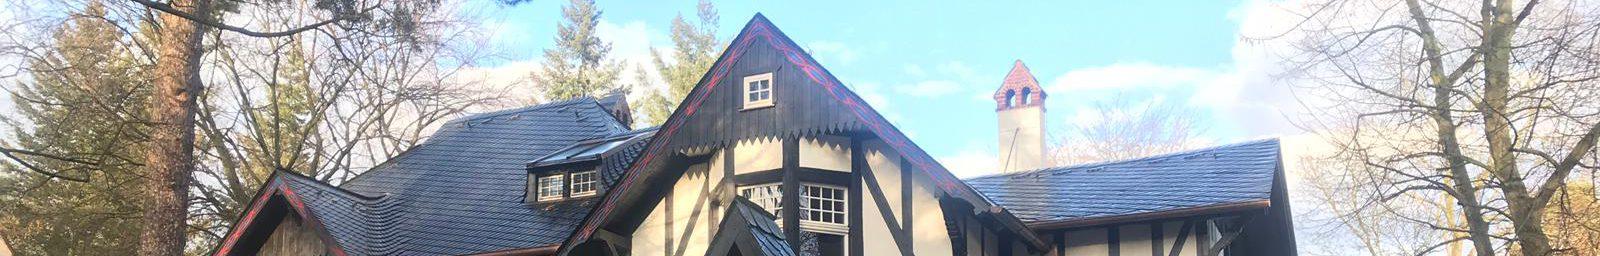 Meisterbetrieb Dachdeckerei Lange